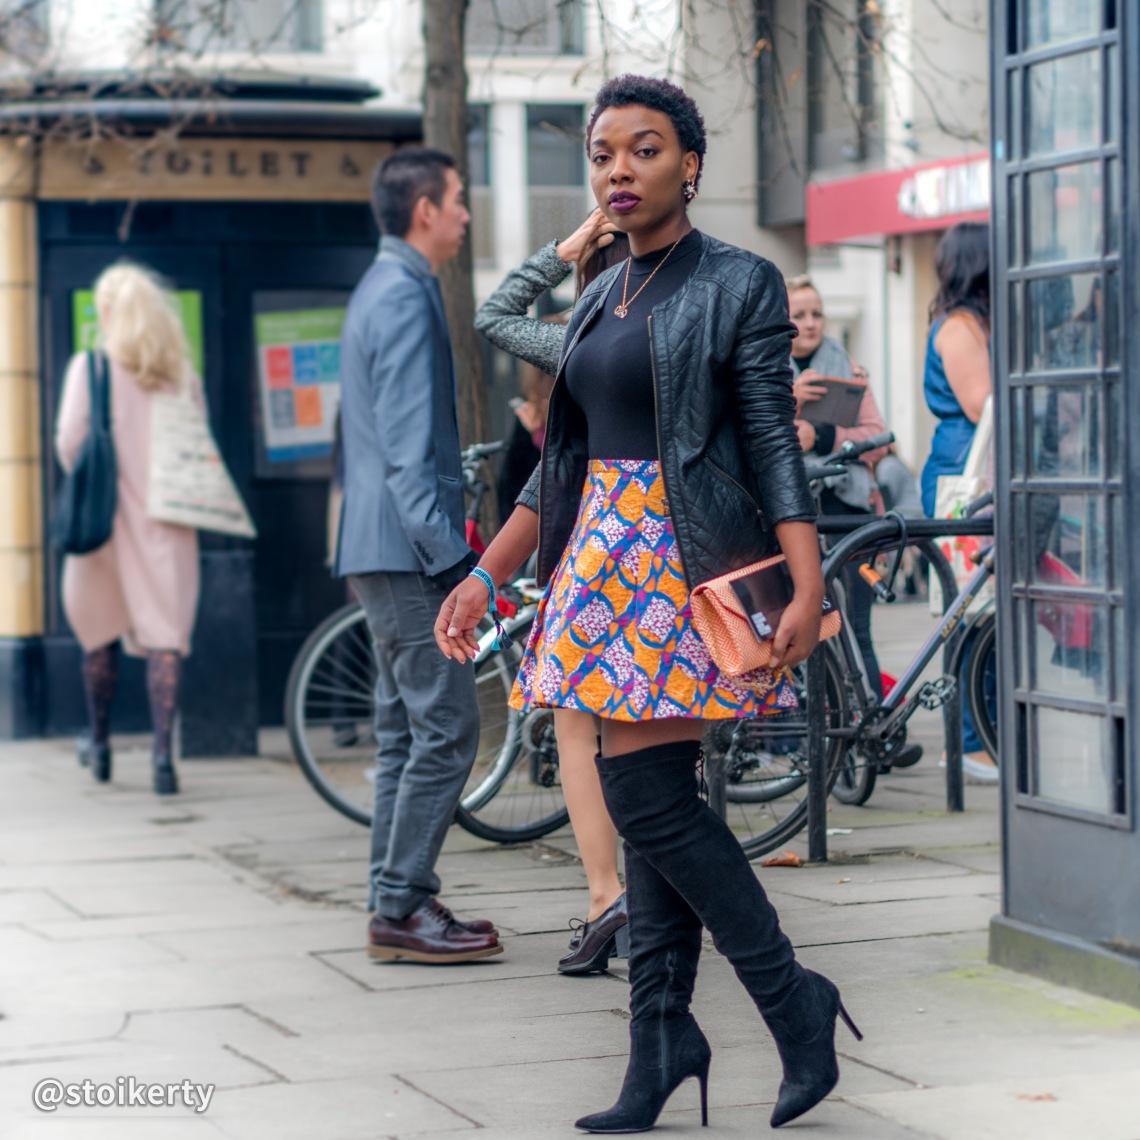 P2260108 - London Fashion Week.jpg